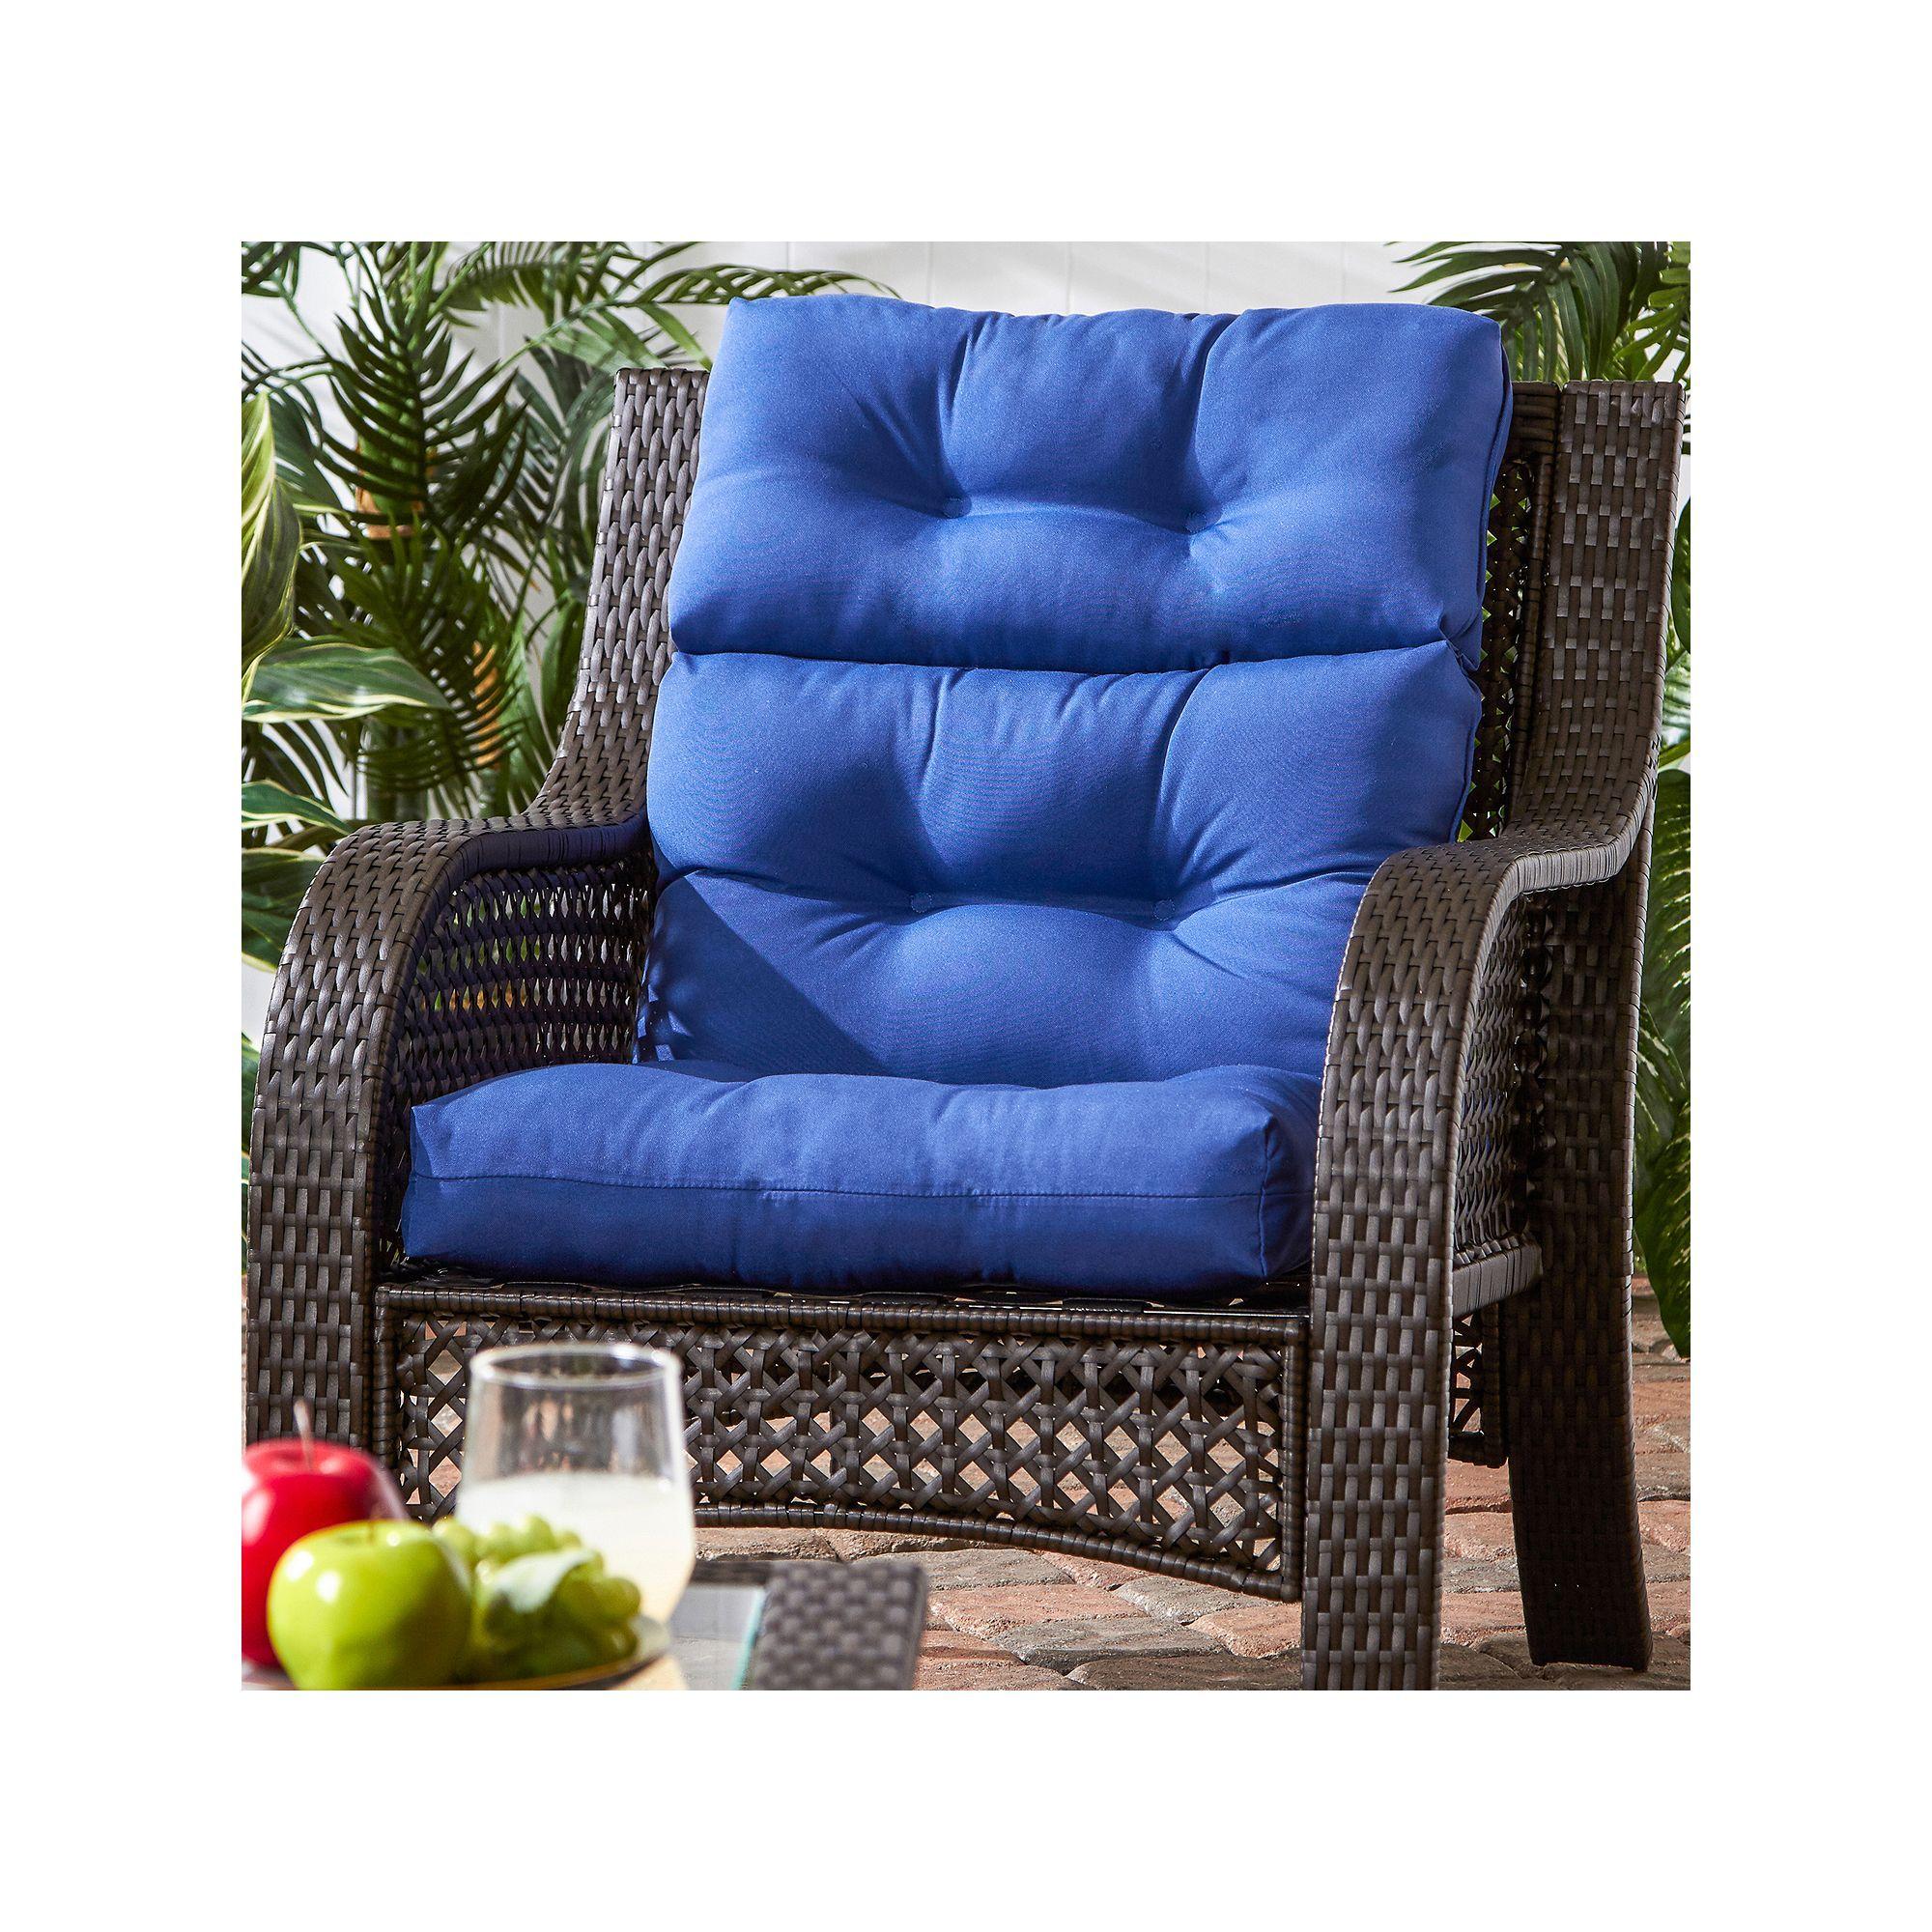 Greendale Home Fashions Outdoor HighBack Chair Cushion